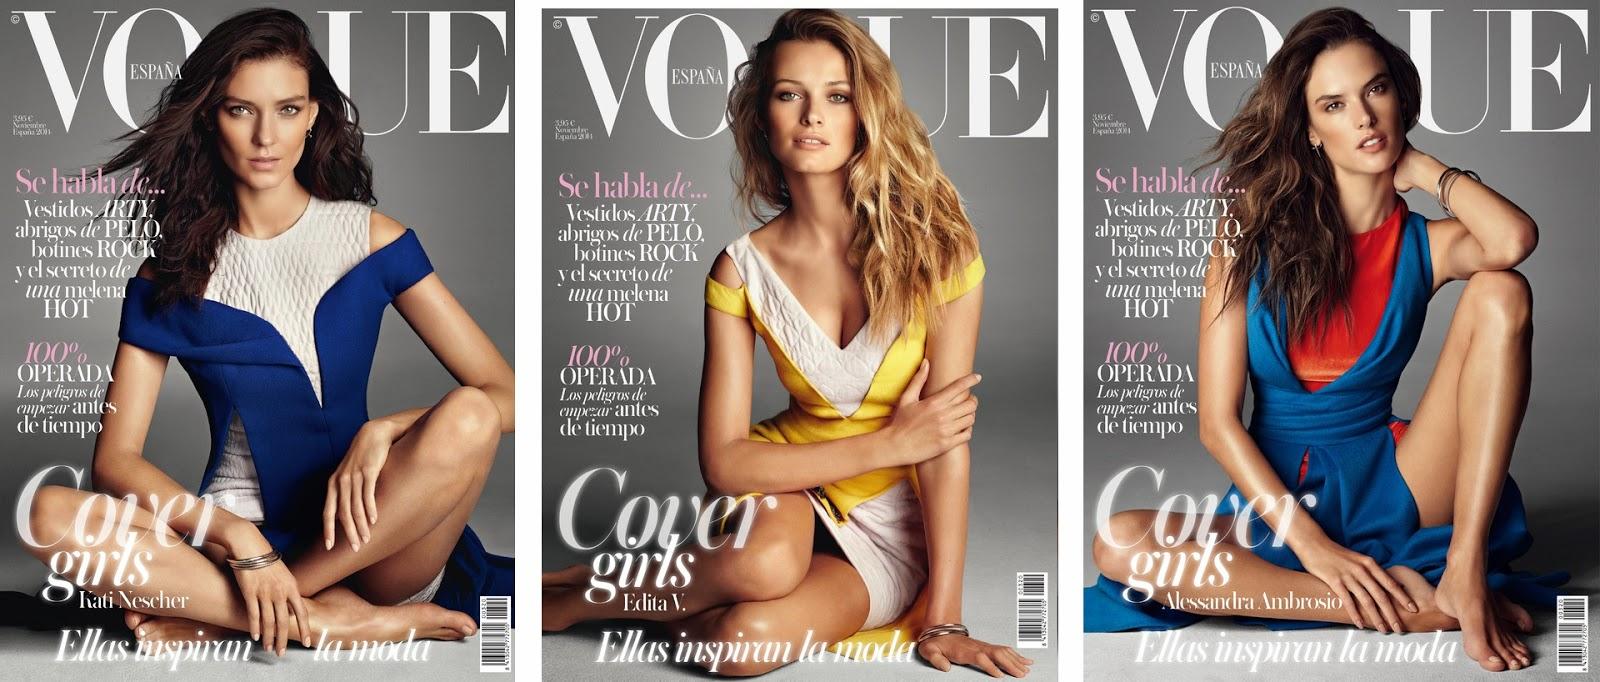 revista woman noviembre 2014